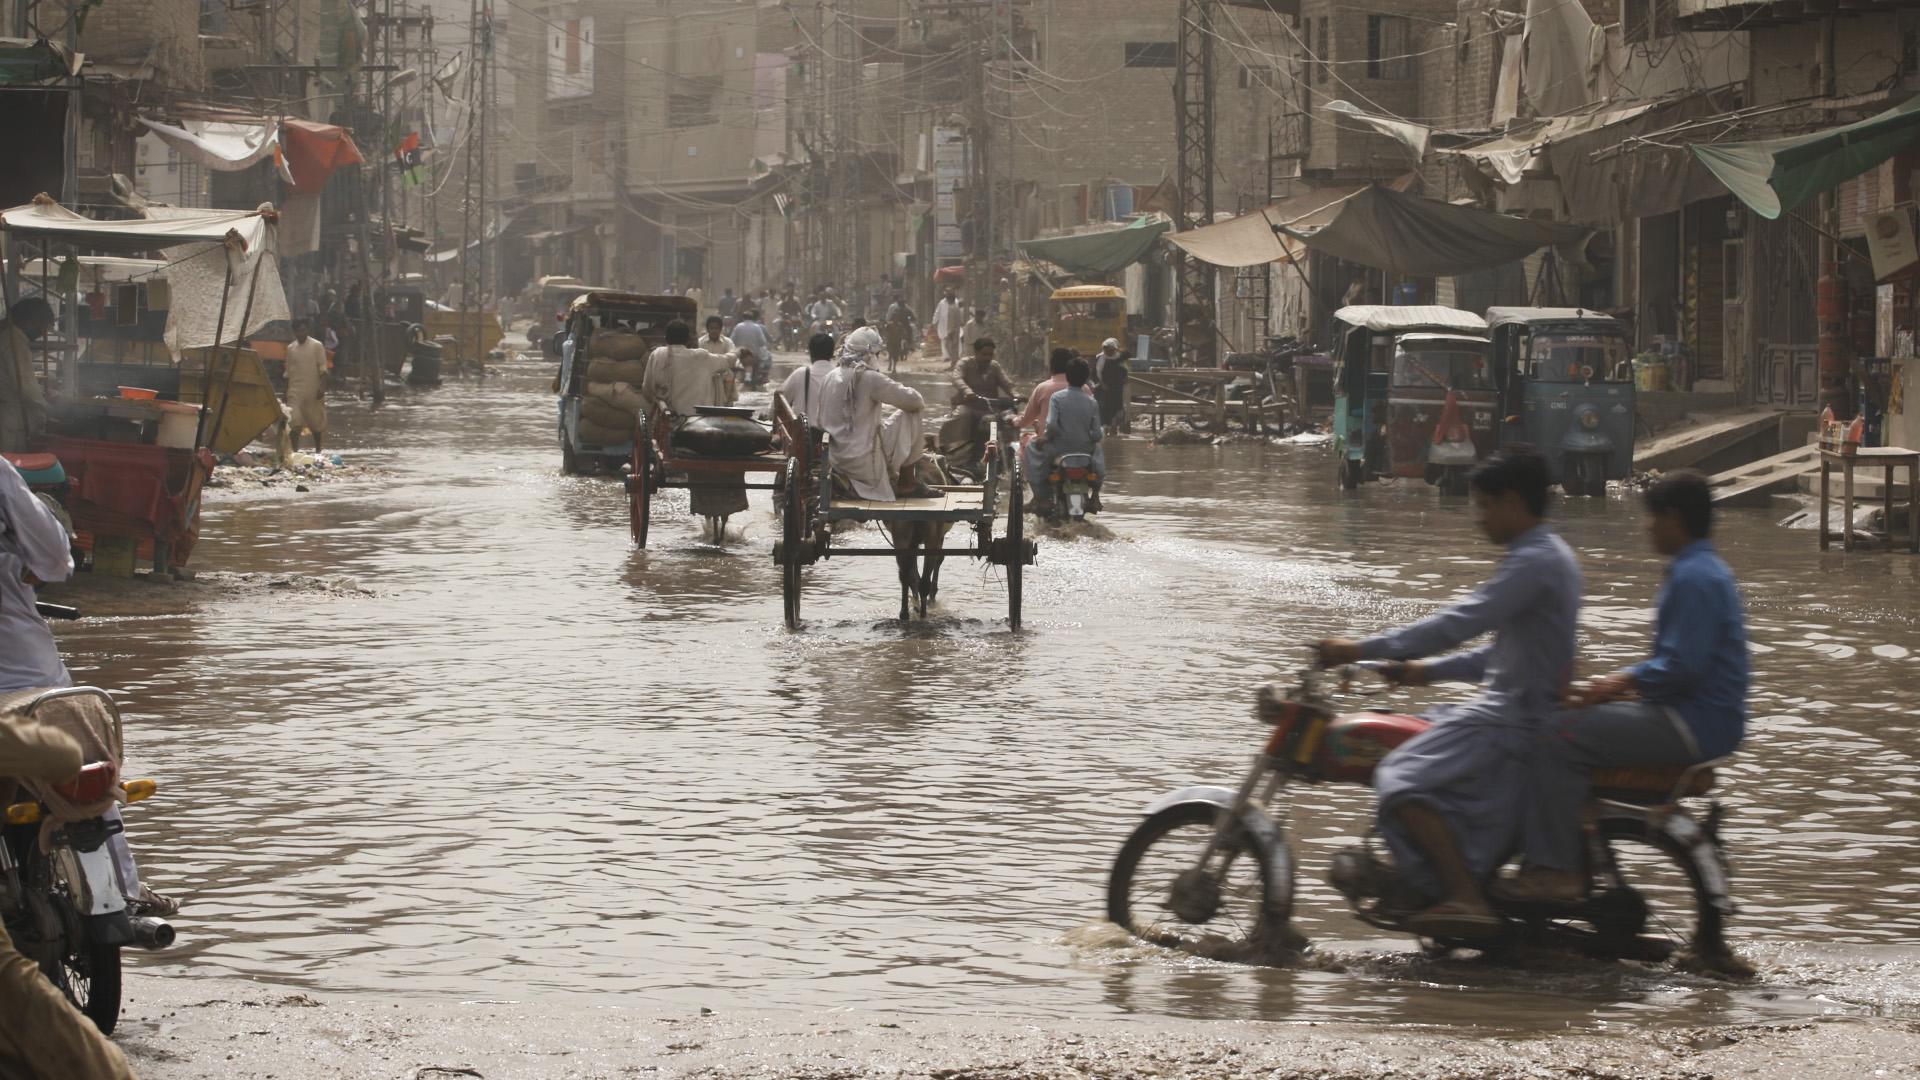 Episode4_LarkanaPakistan_LocalsDriveThroughTheFloodedStreets.jpg